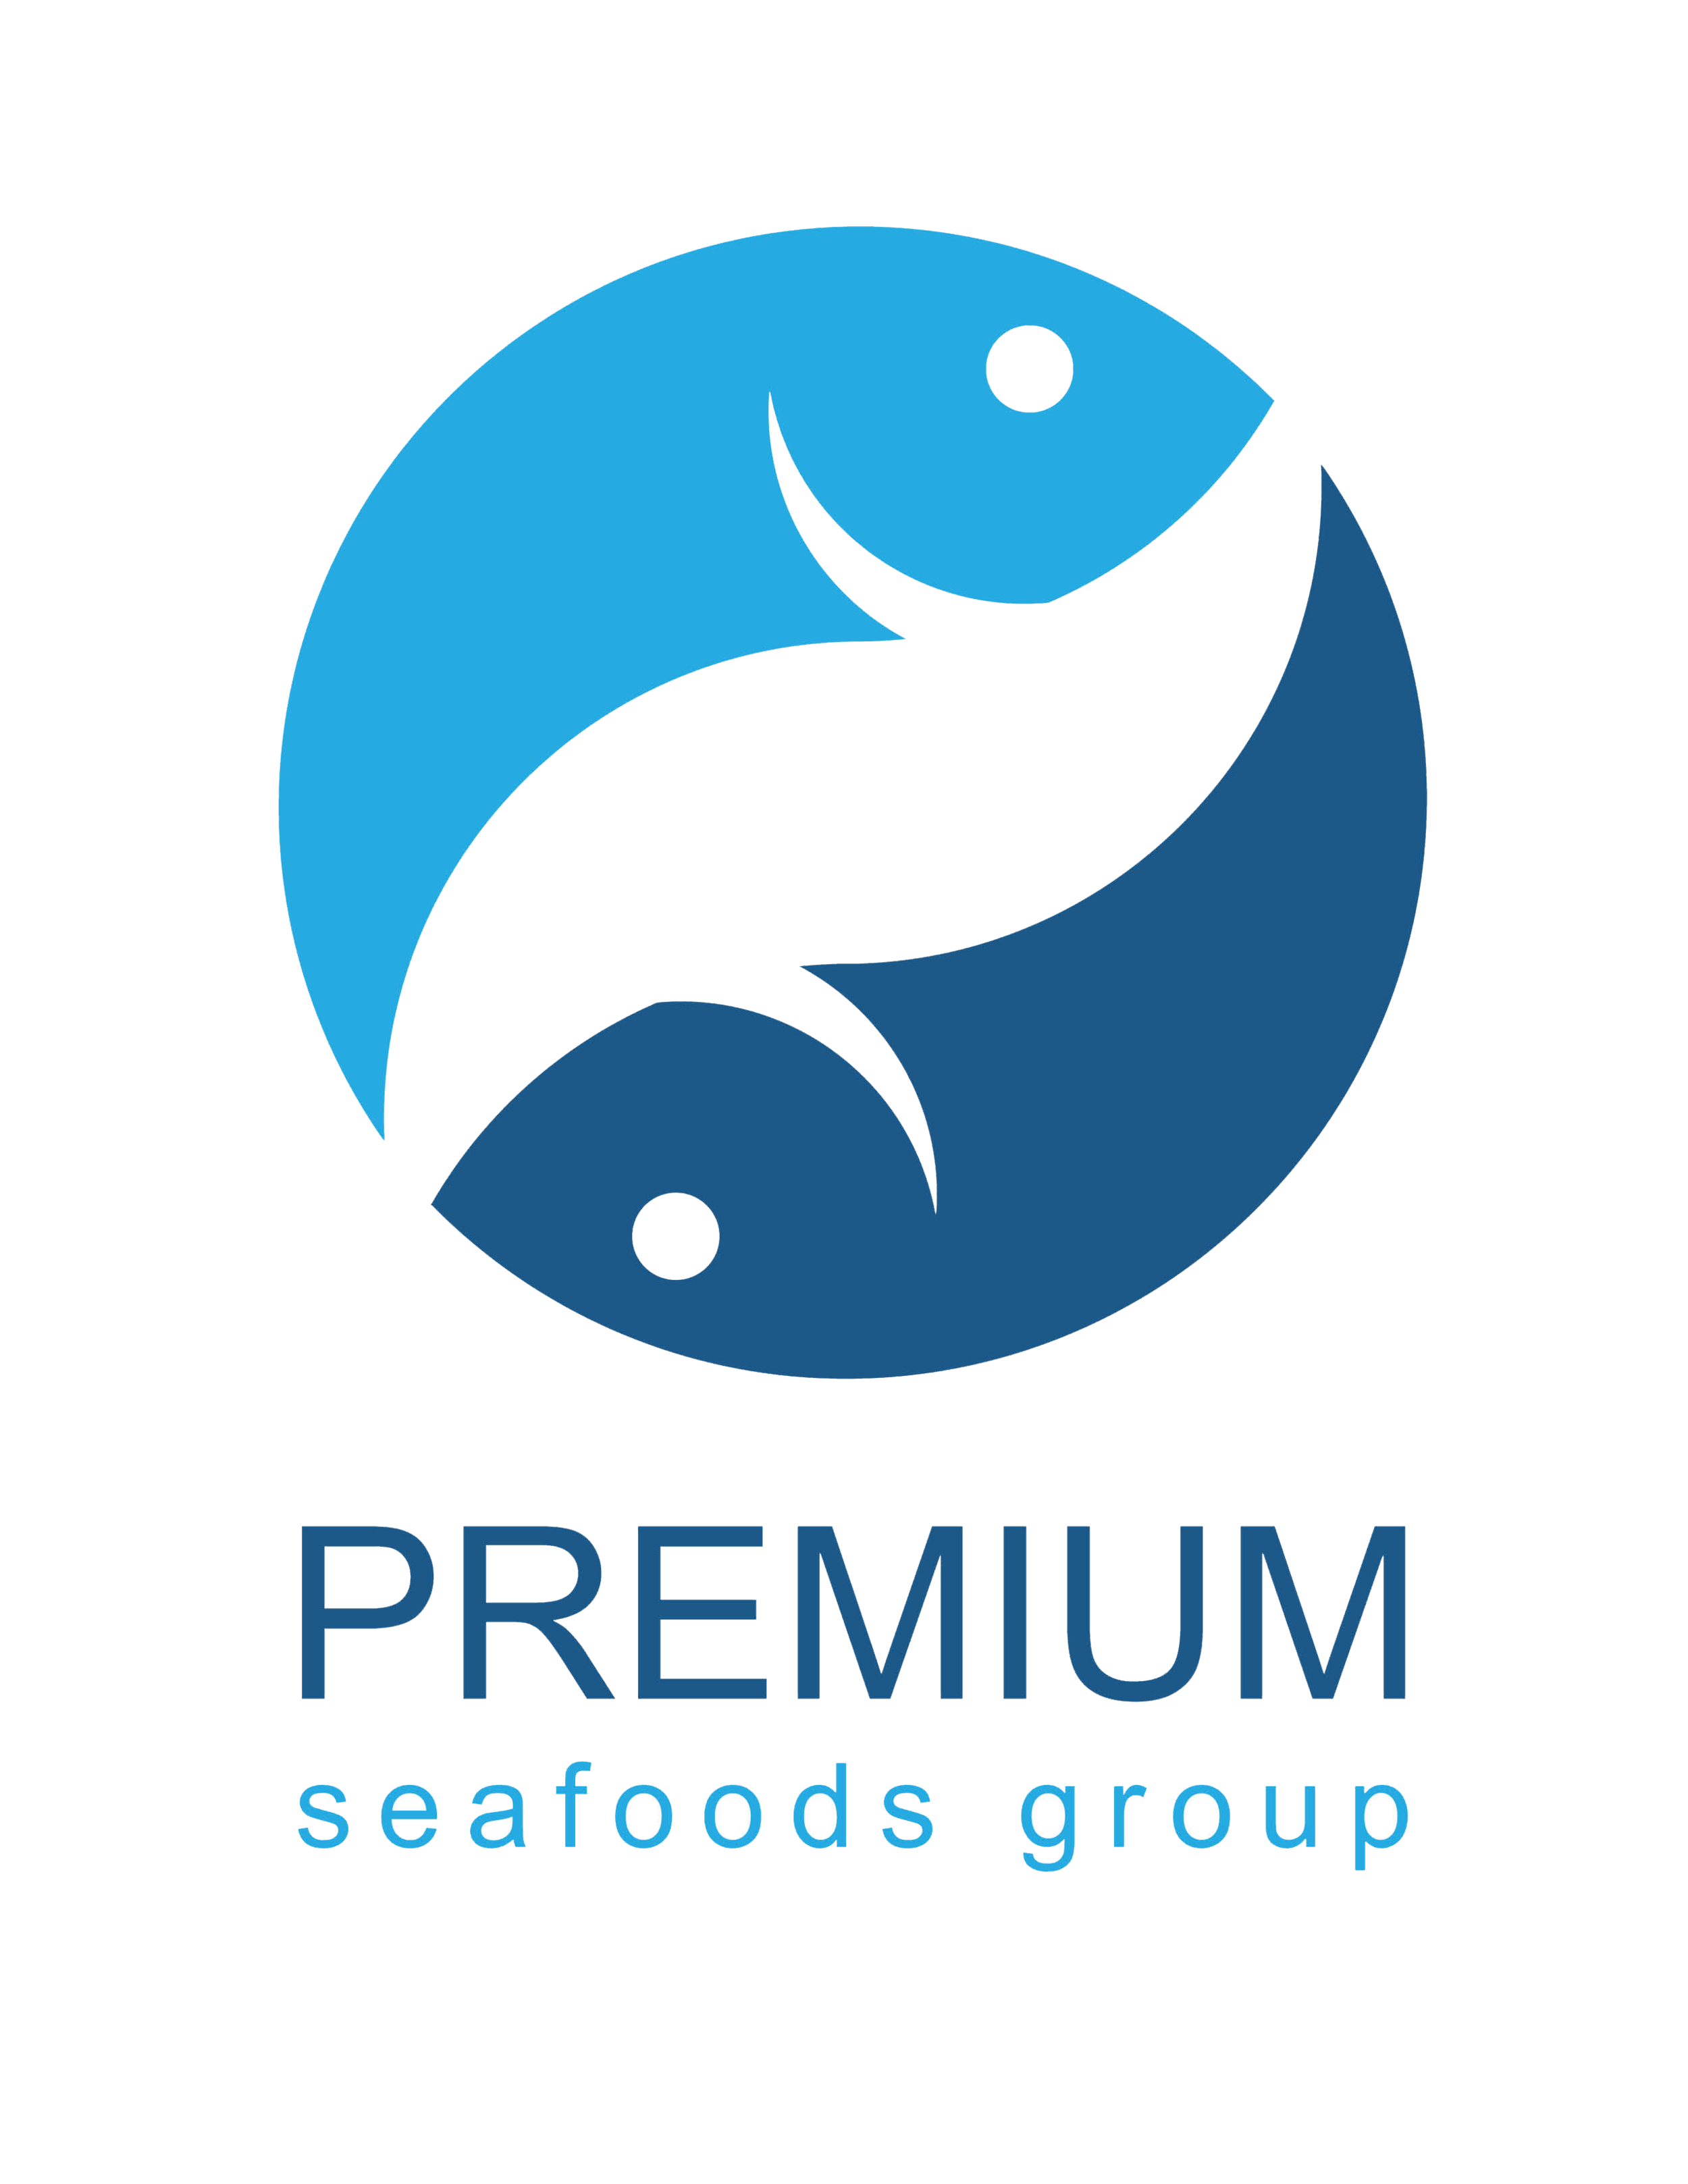 PREMIUM SEAFOODS GROUP LOGO - 2010 (3)[4462].png